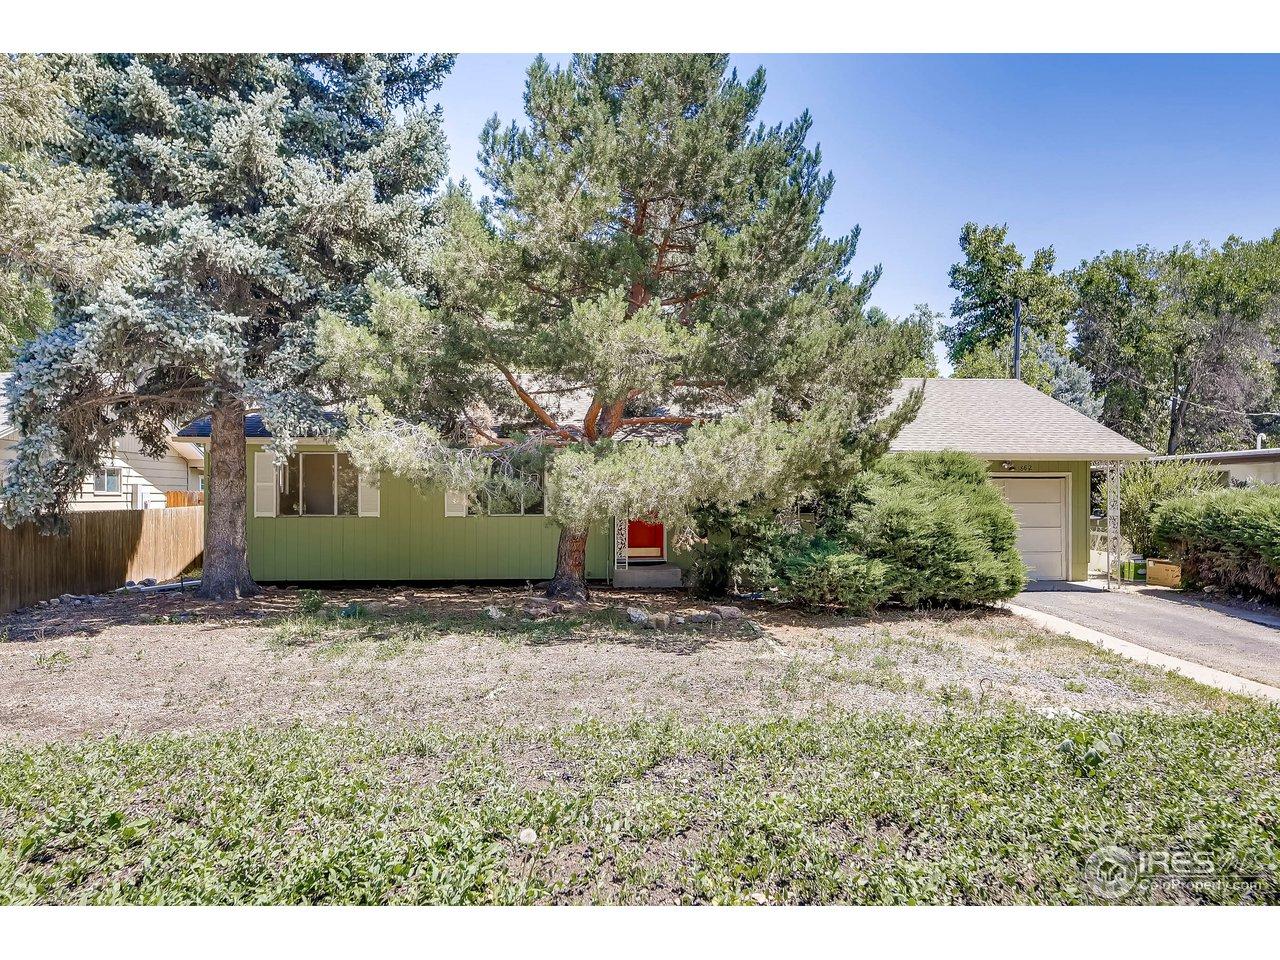 862 55th St, Boulder CO 80303